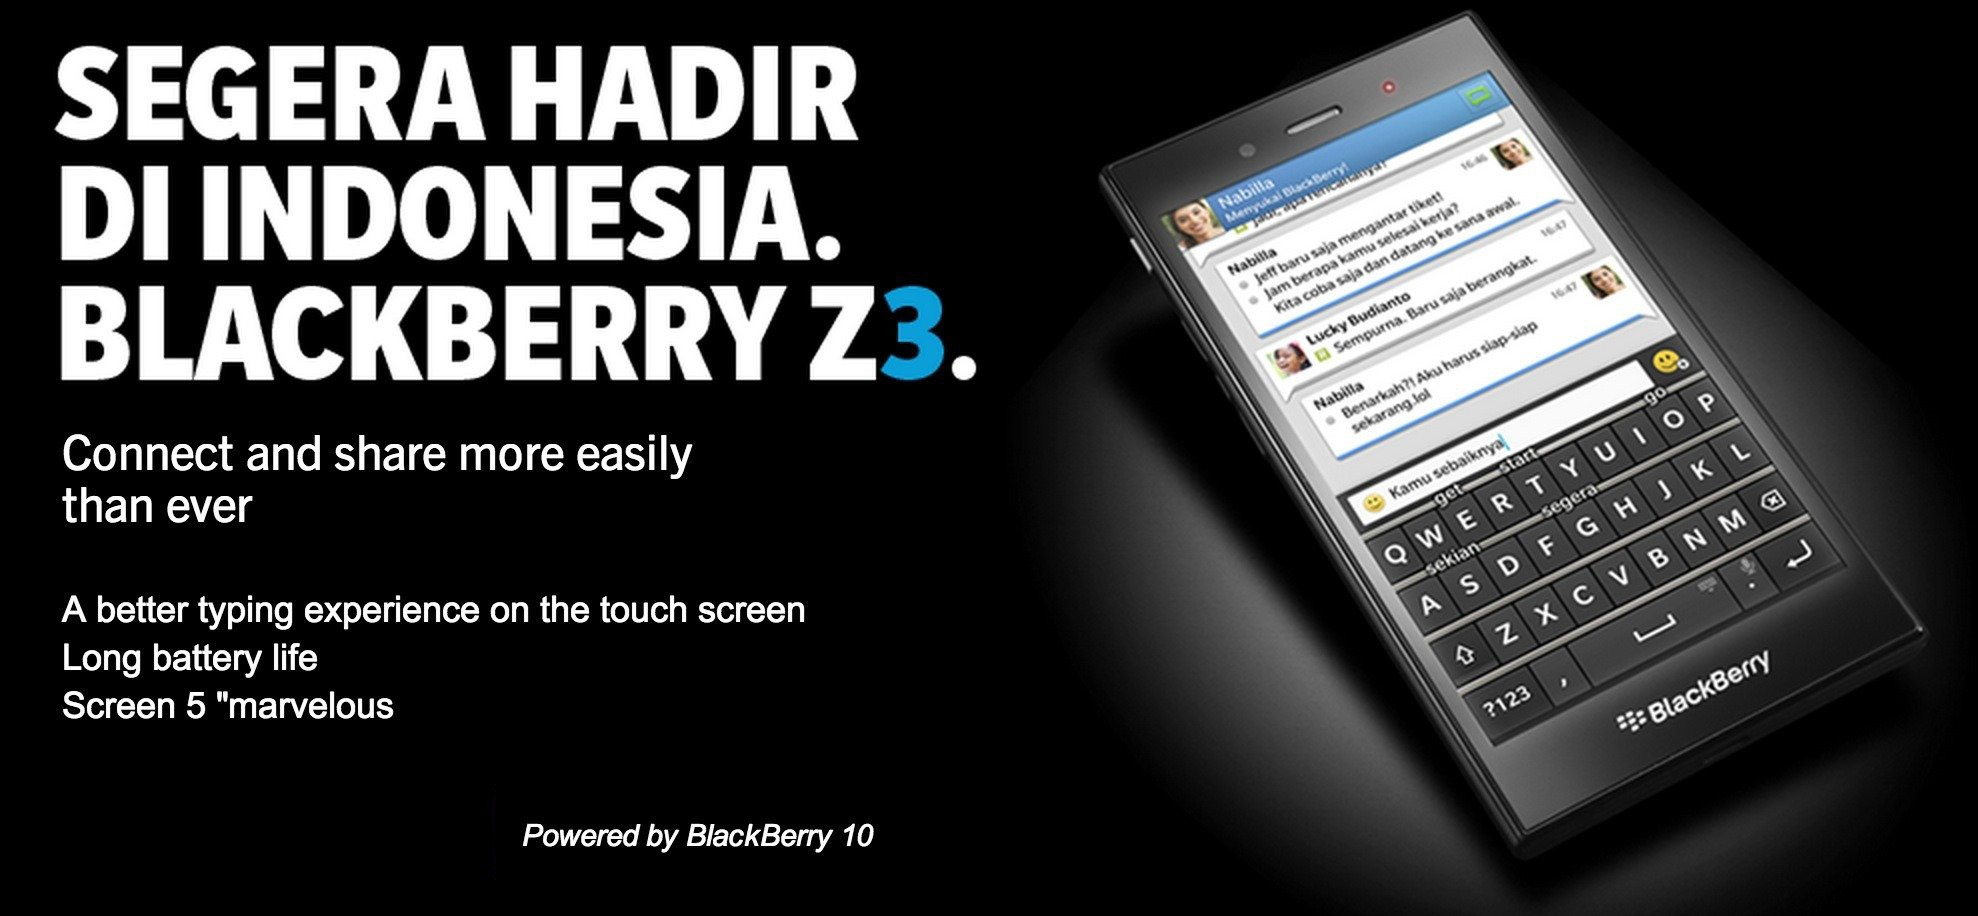 image0015 - BlackBerry Z3 bán ra từ 13/5